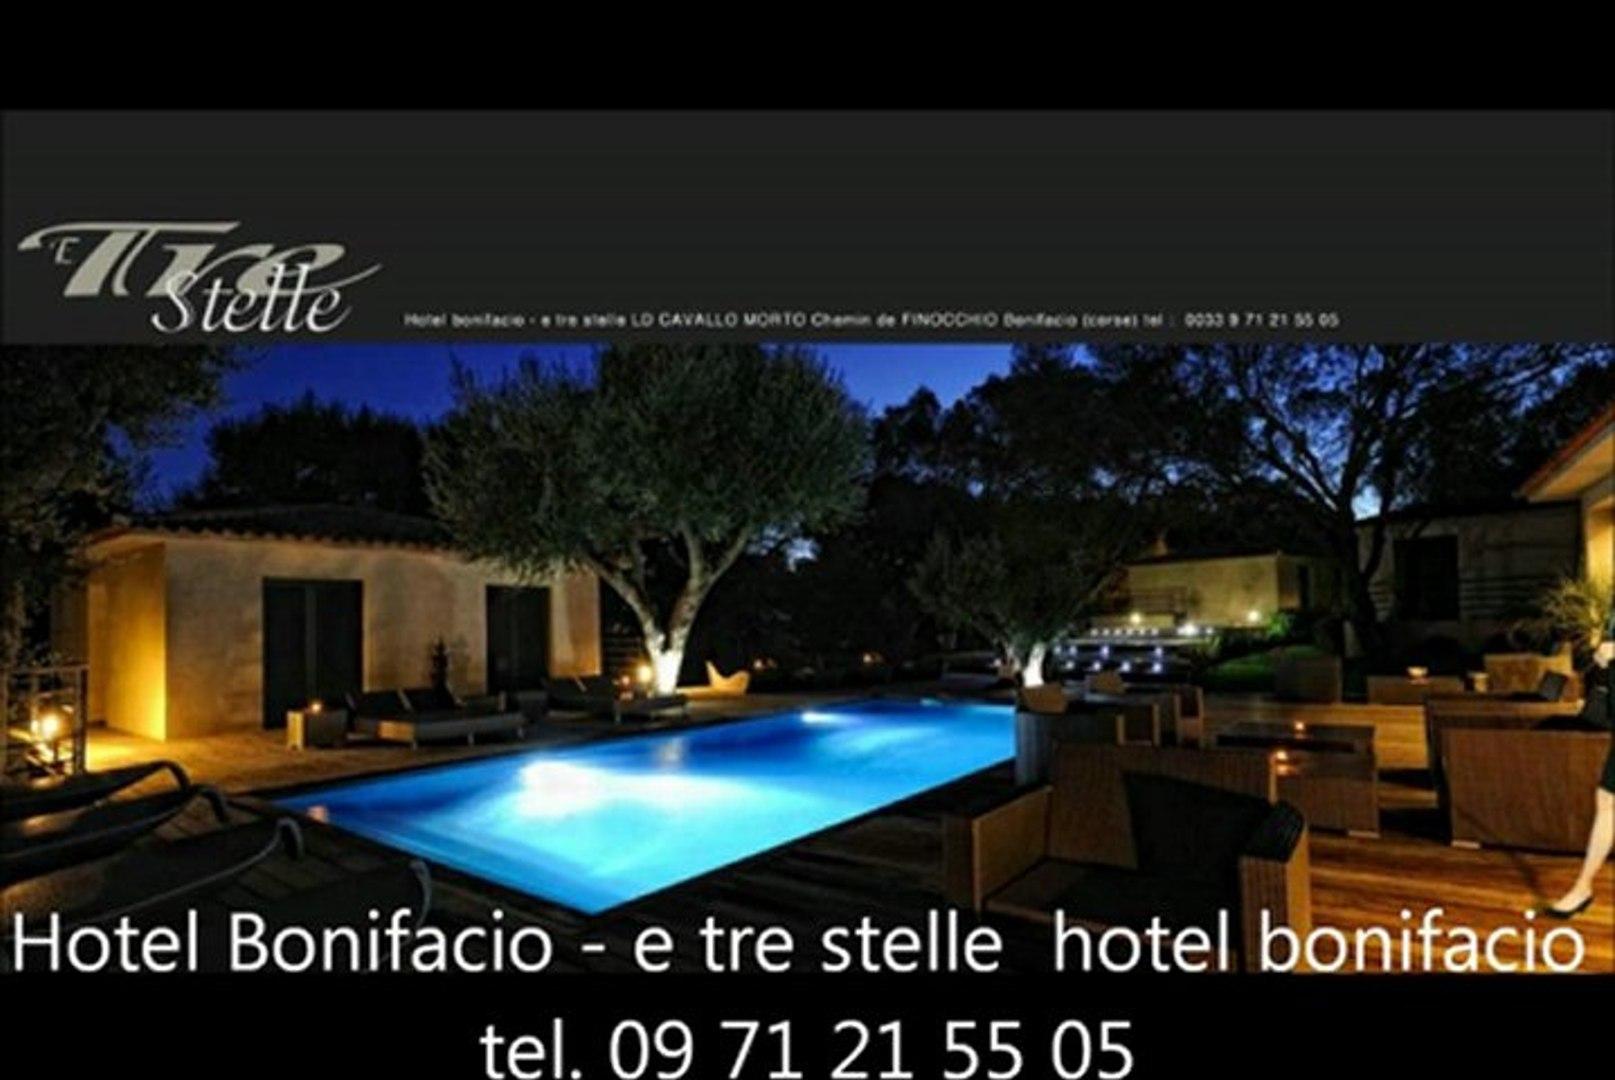 hotel bonifacio tel. 09 71 21 55 05 -